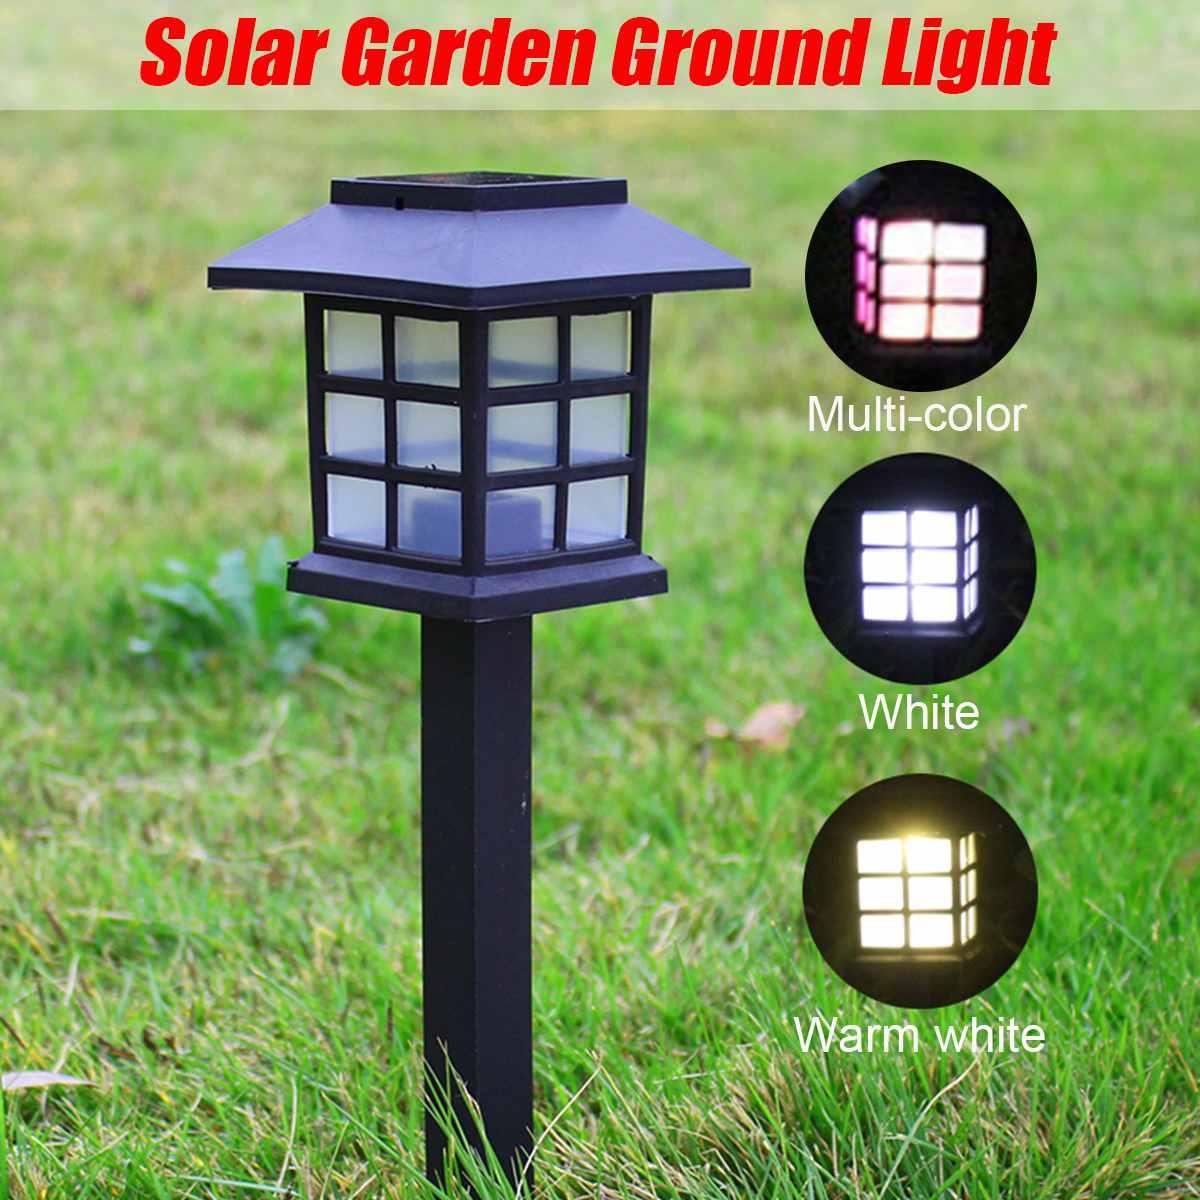 House Shaped LED Solar Lights Outdoor Garden Decoration Plastic Sensor Sunlight Waterproof Garden Stair Courtyard Pathway Lamps